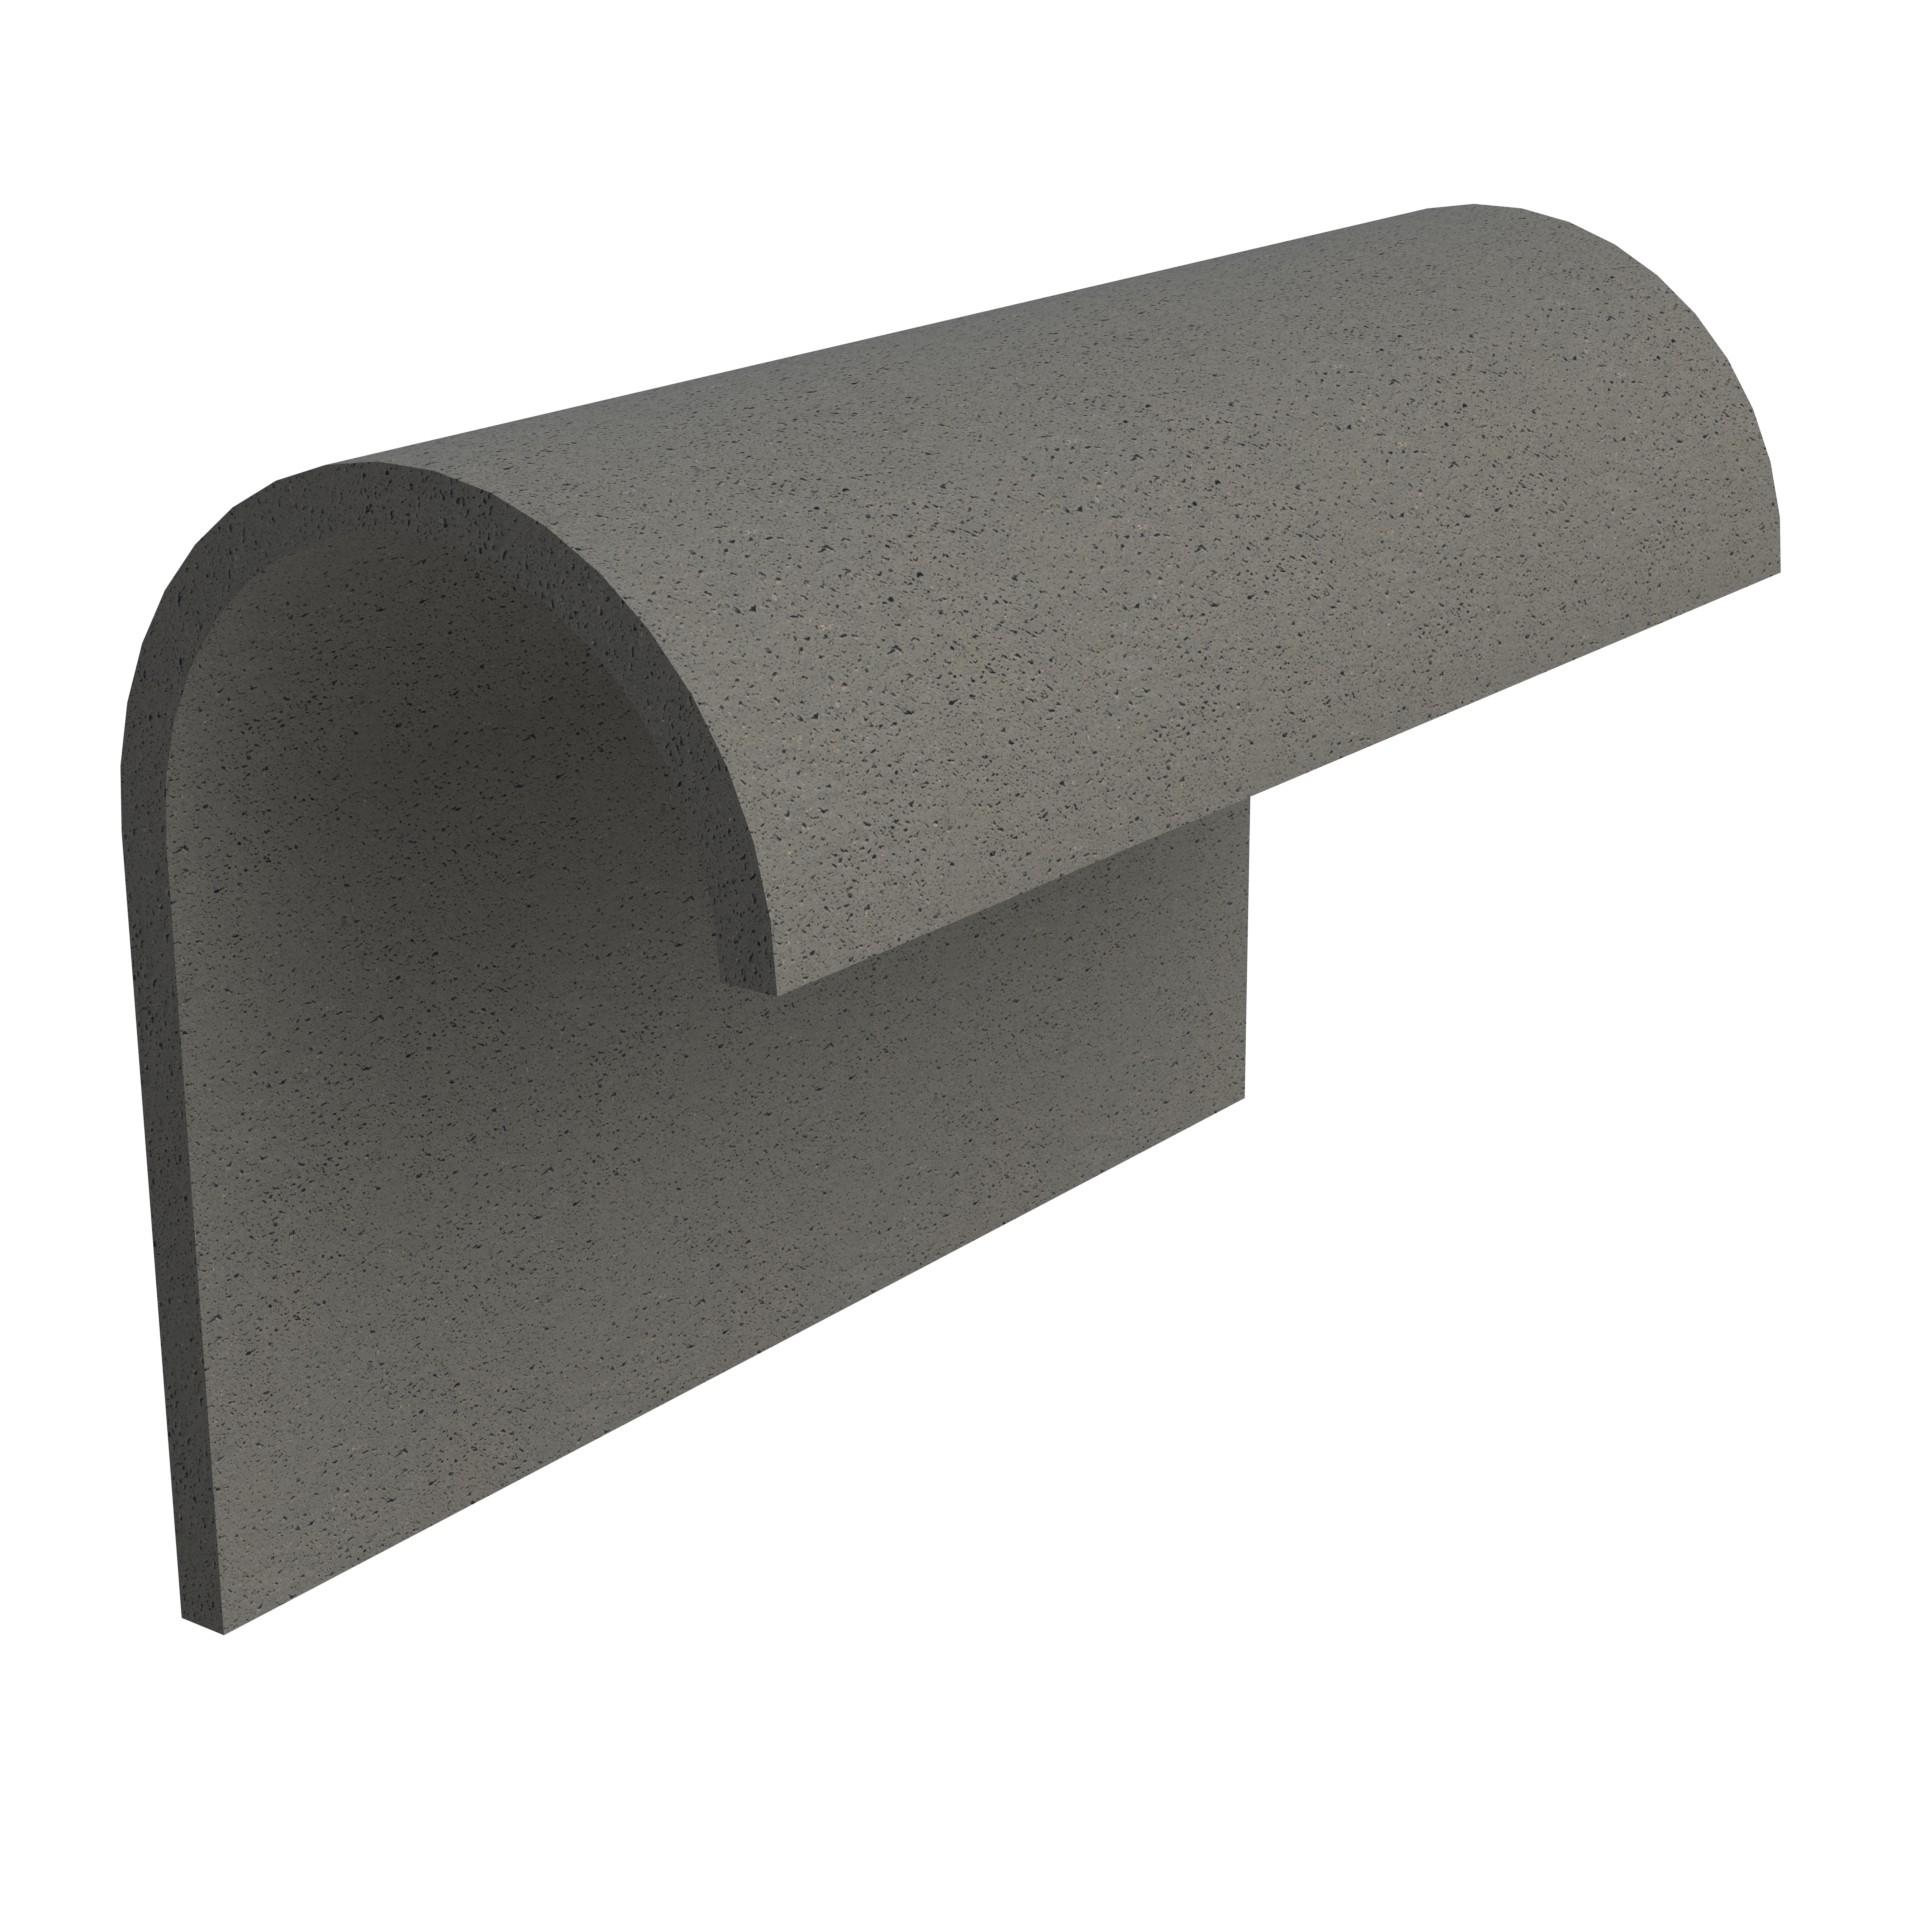 SANDTOFT TILES - Concrete Half Round Mono Ridge